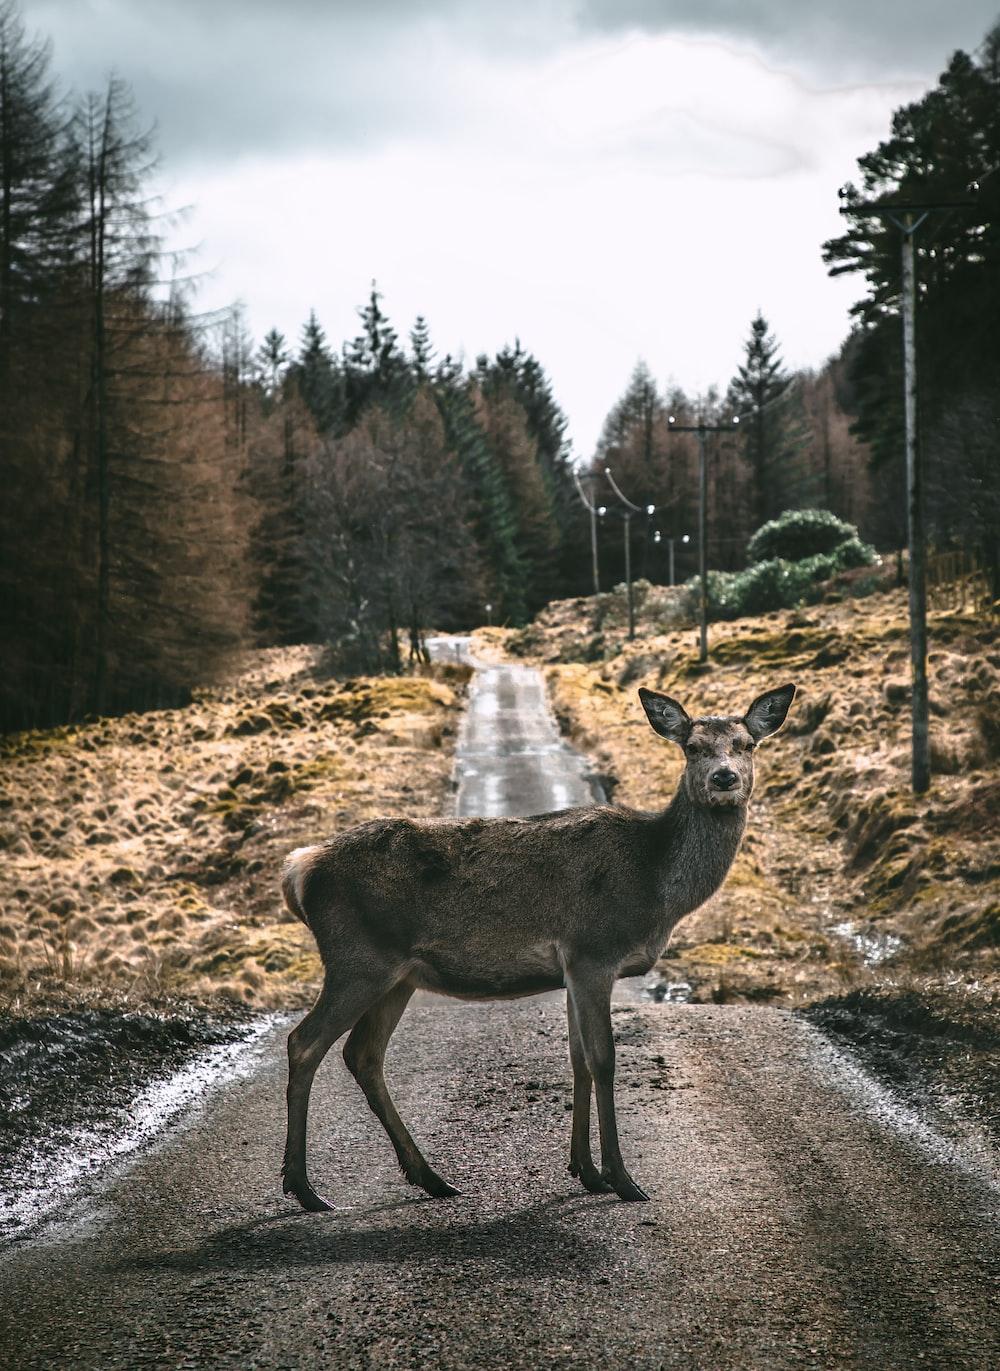 brown deer on road pathway during daytime